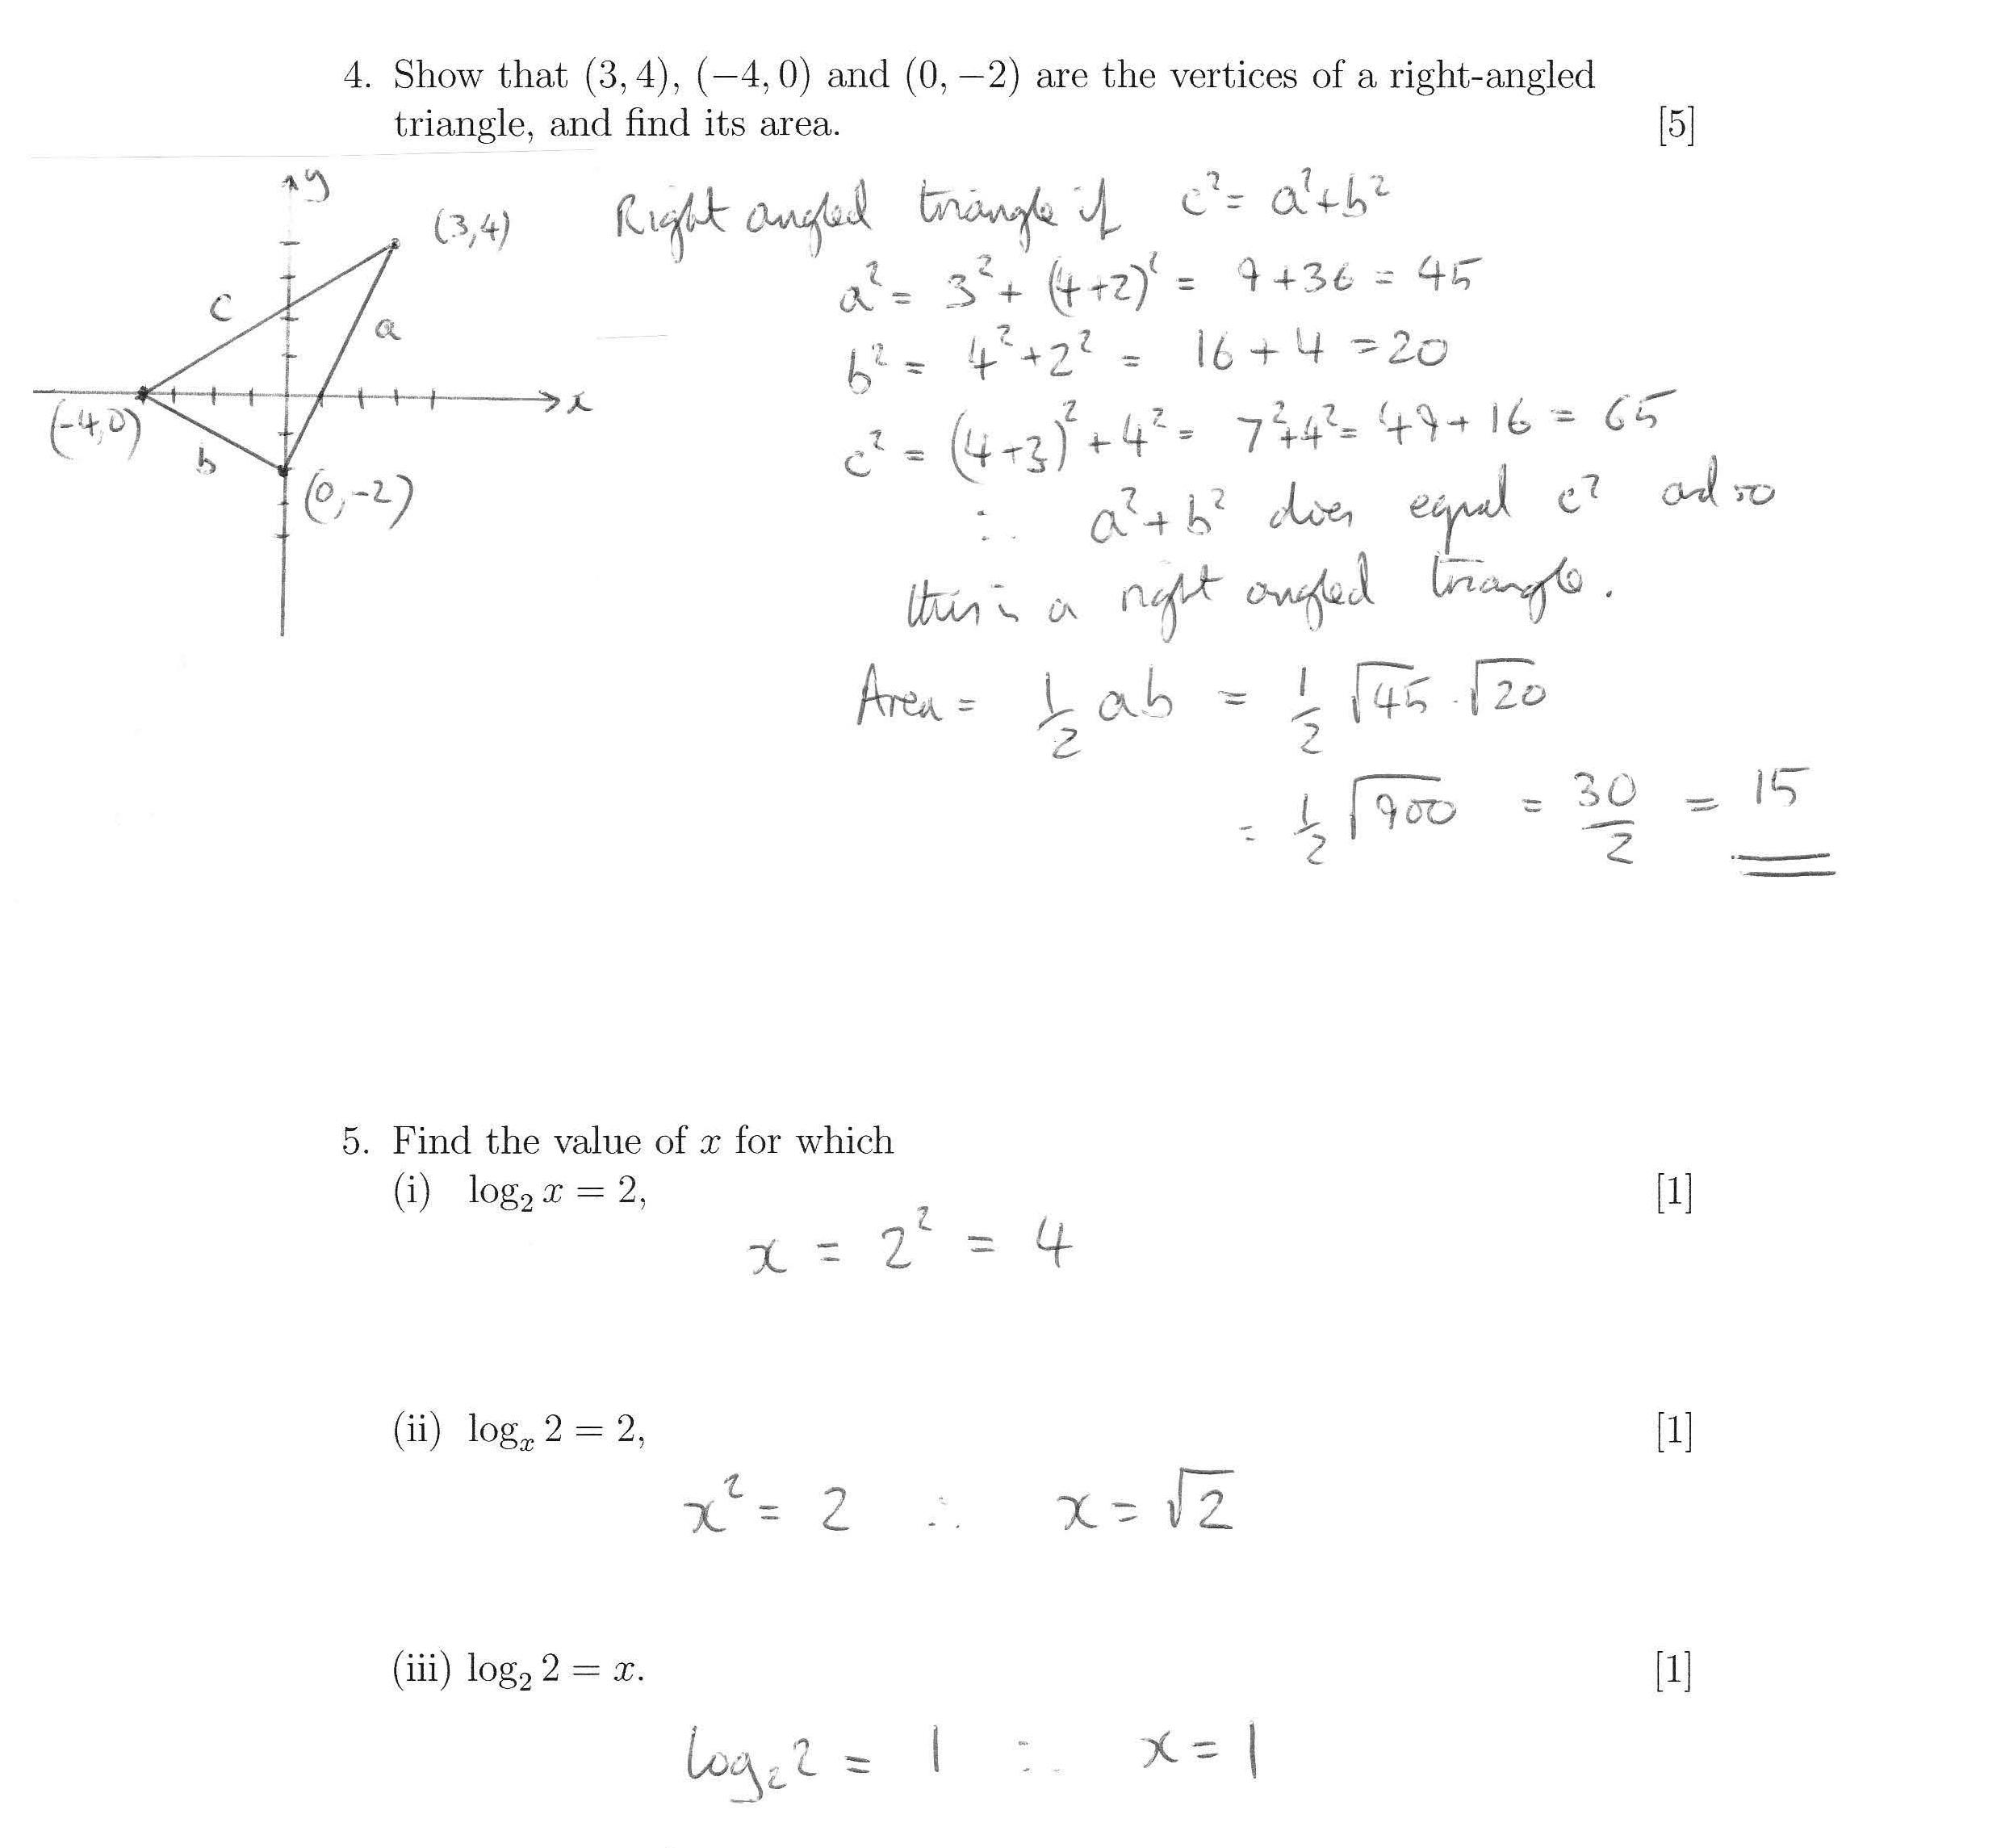 pat2009specimensolutions真题与答案解析